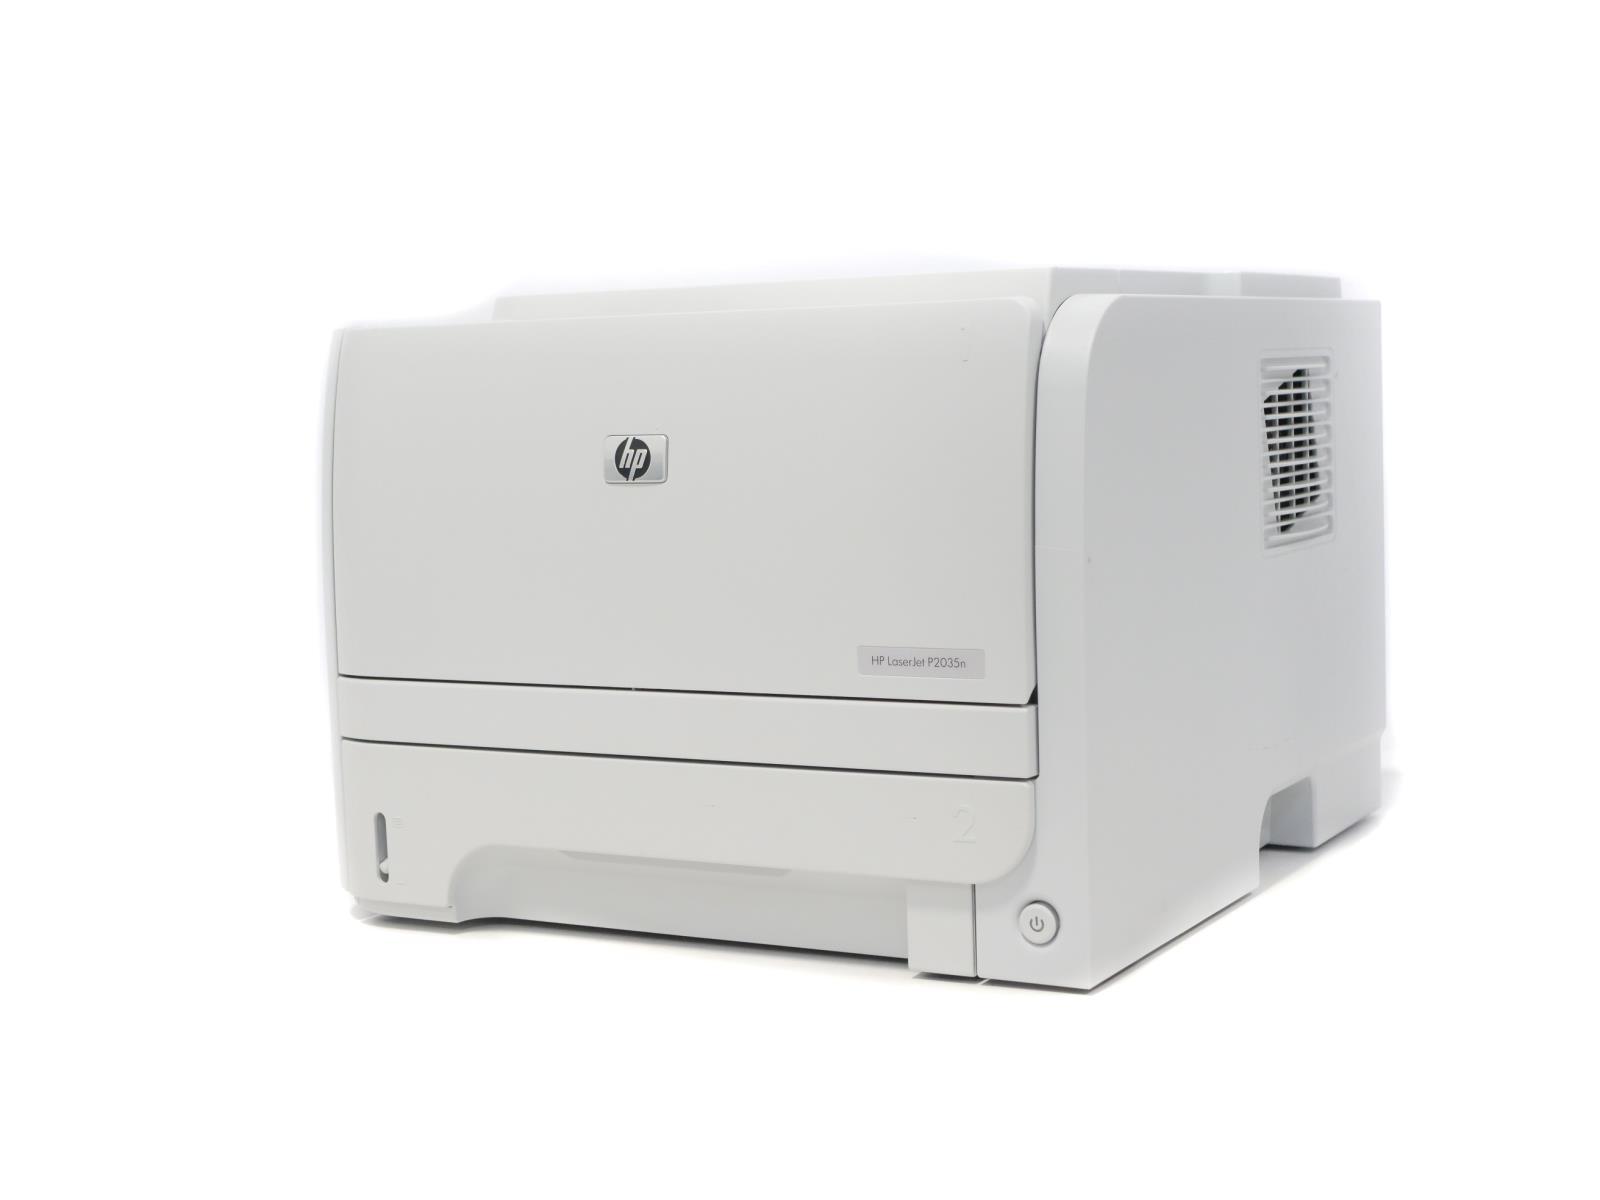 HP LASERJET P2035N PRINT SERVER DESCARGAR CONTROLADOR